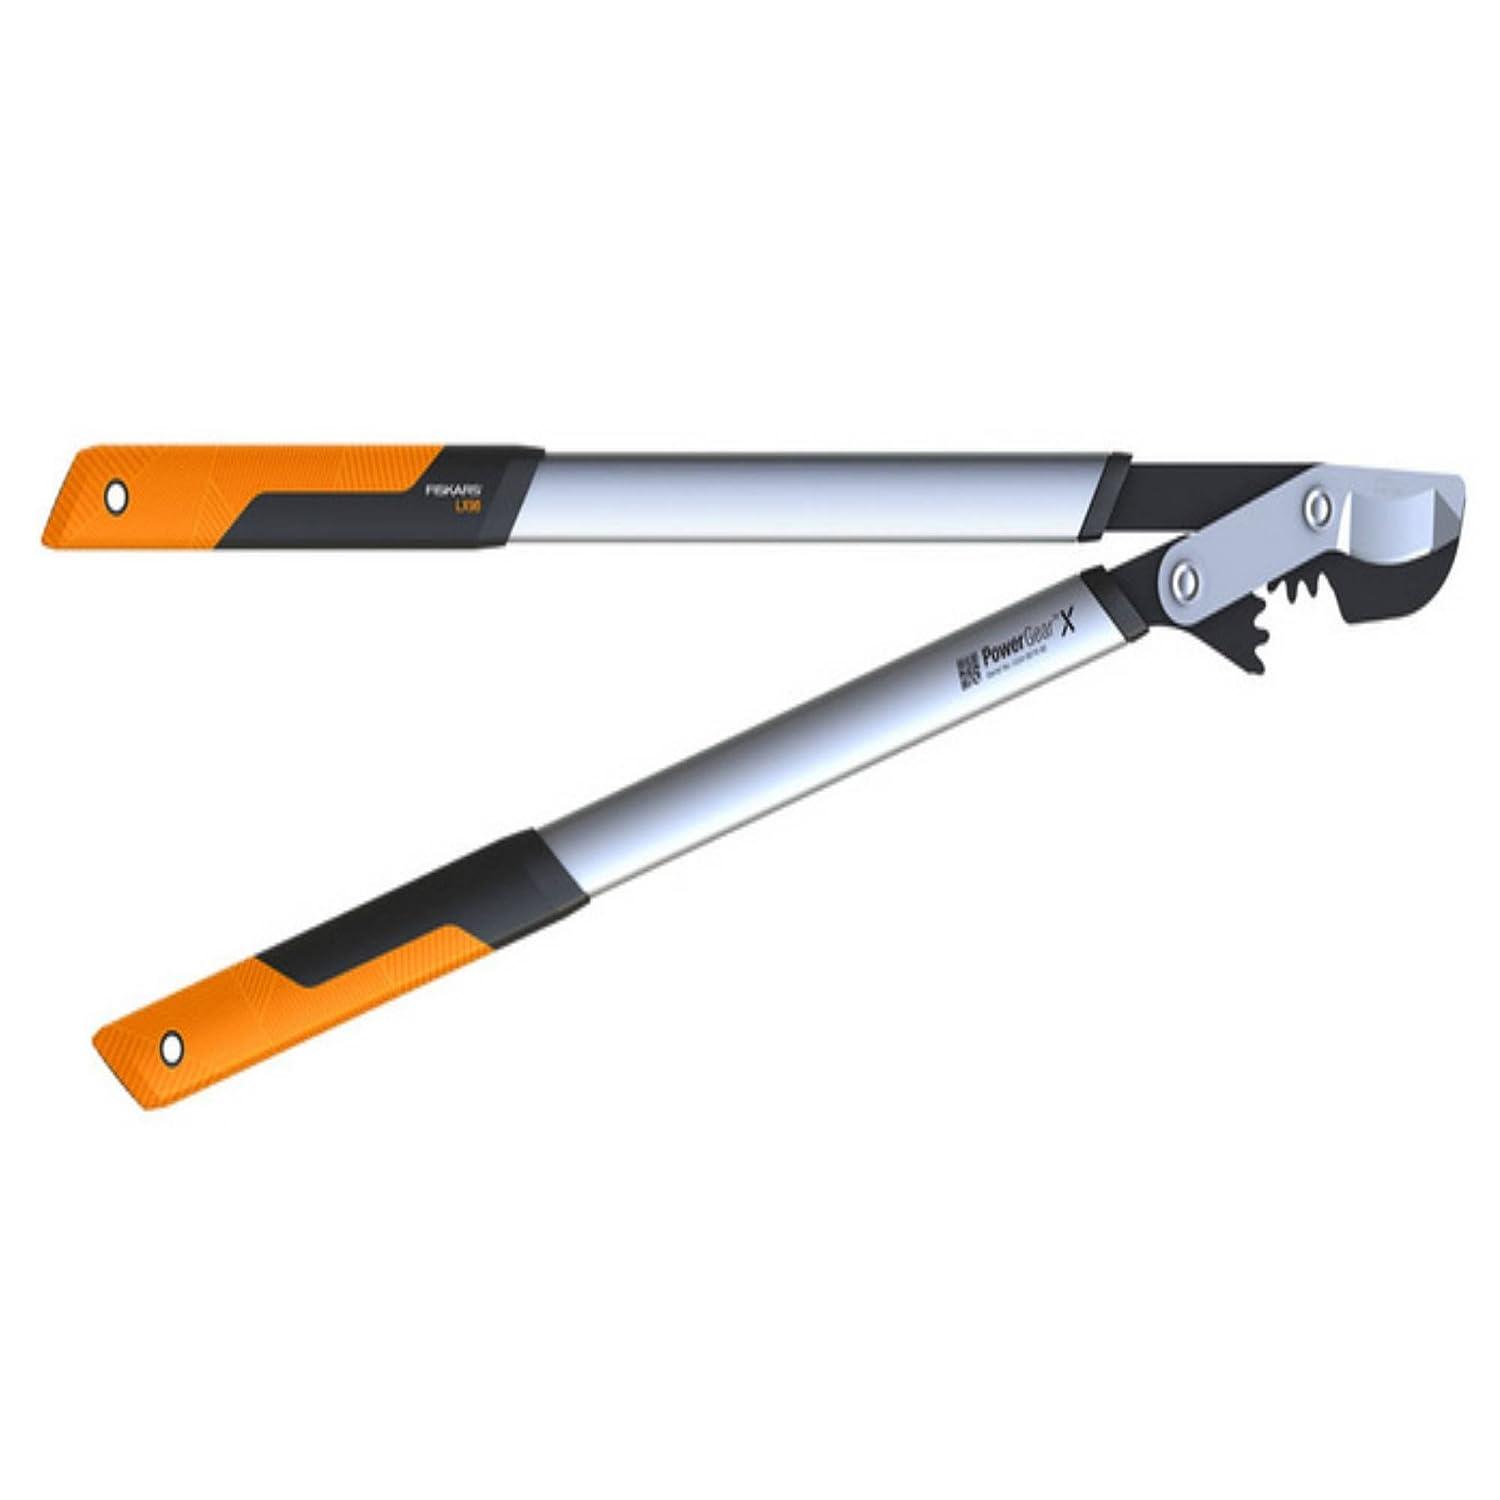 Fiskars PowerGear X Lopper Anvil L LX99, Size L, Cutting diameter: 5.5 cm, Non-stick coating, Hardened steel, Length: 80 cm, Black/Orange, 1020189